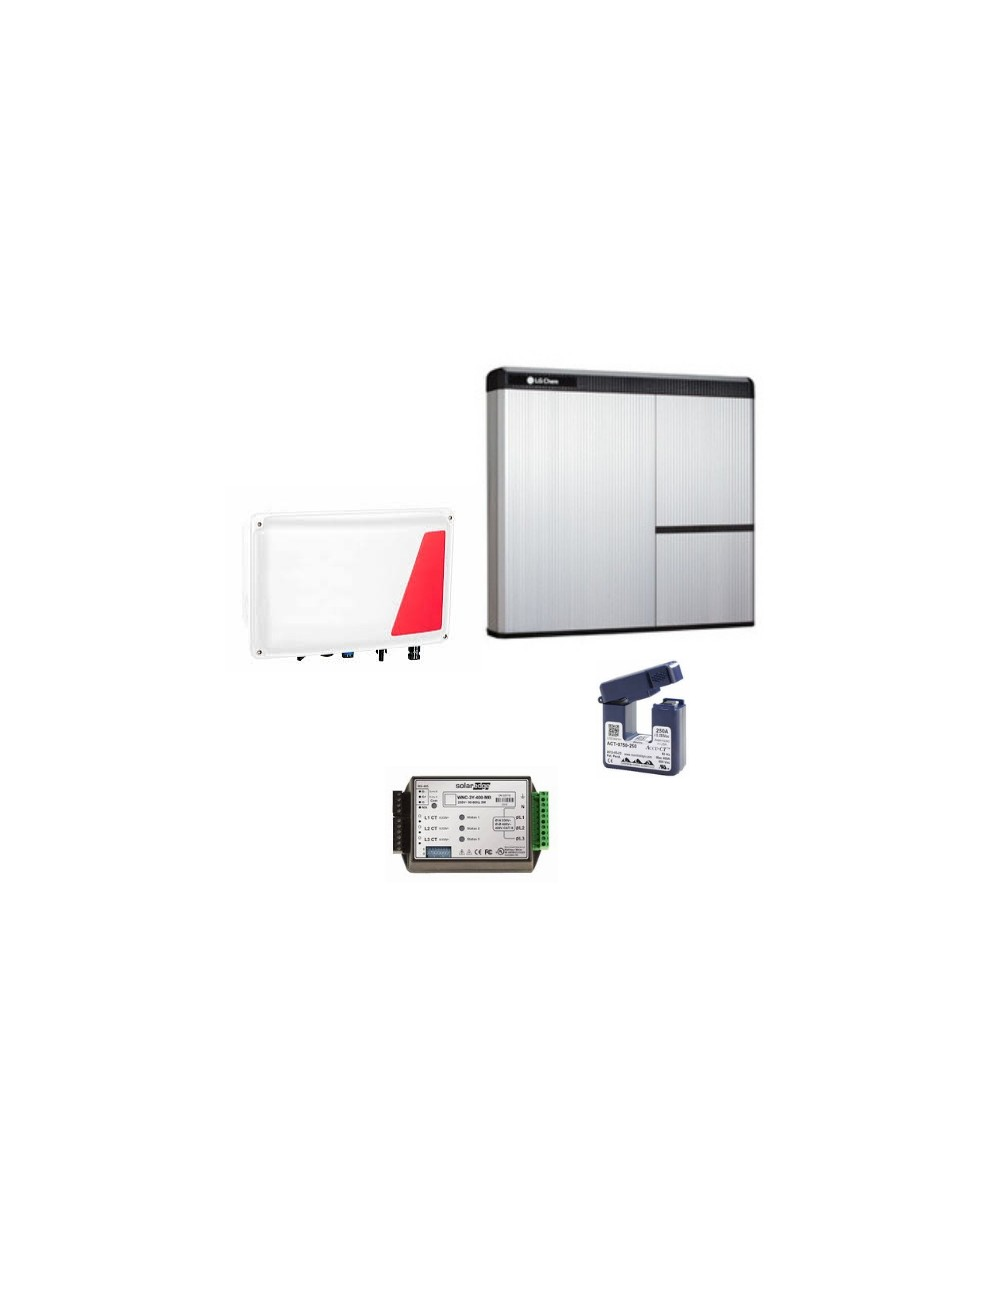 Kit Accumulo Fotovoltaico Retrofit LG Chem 7 kWh e Interfaccia Storedge SESTI-04